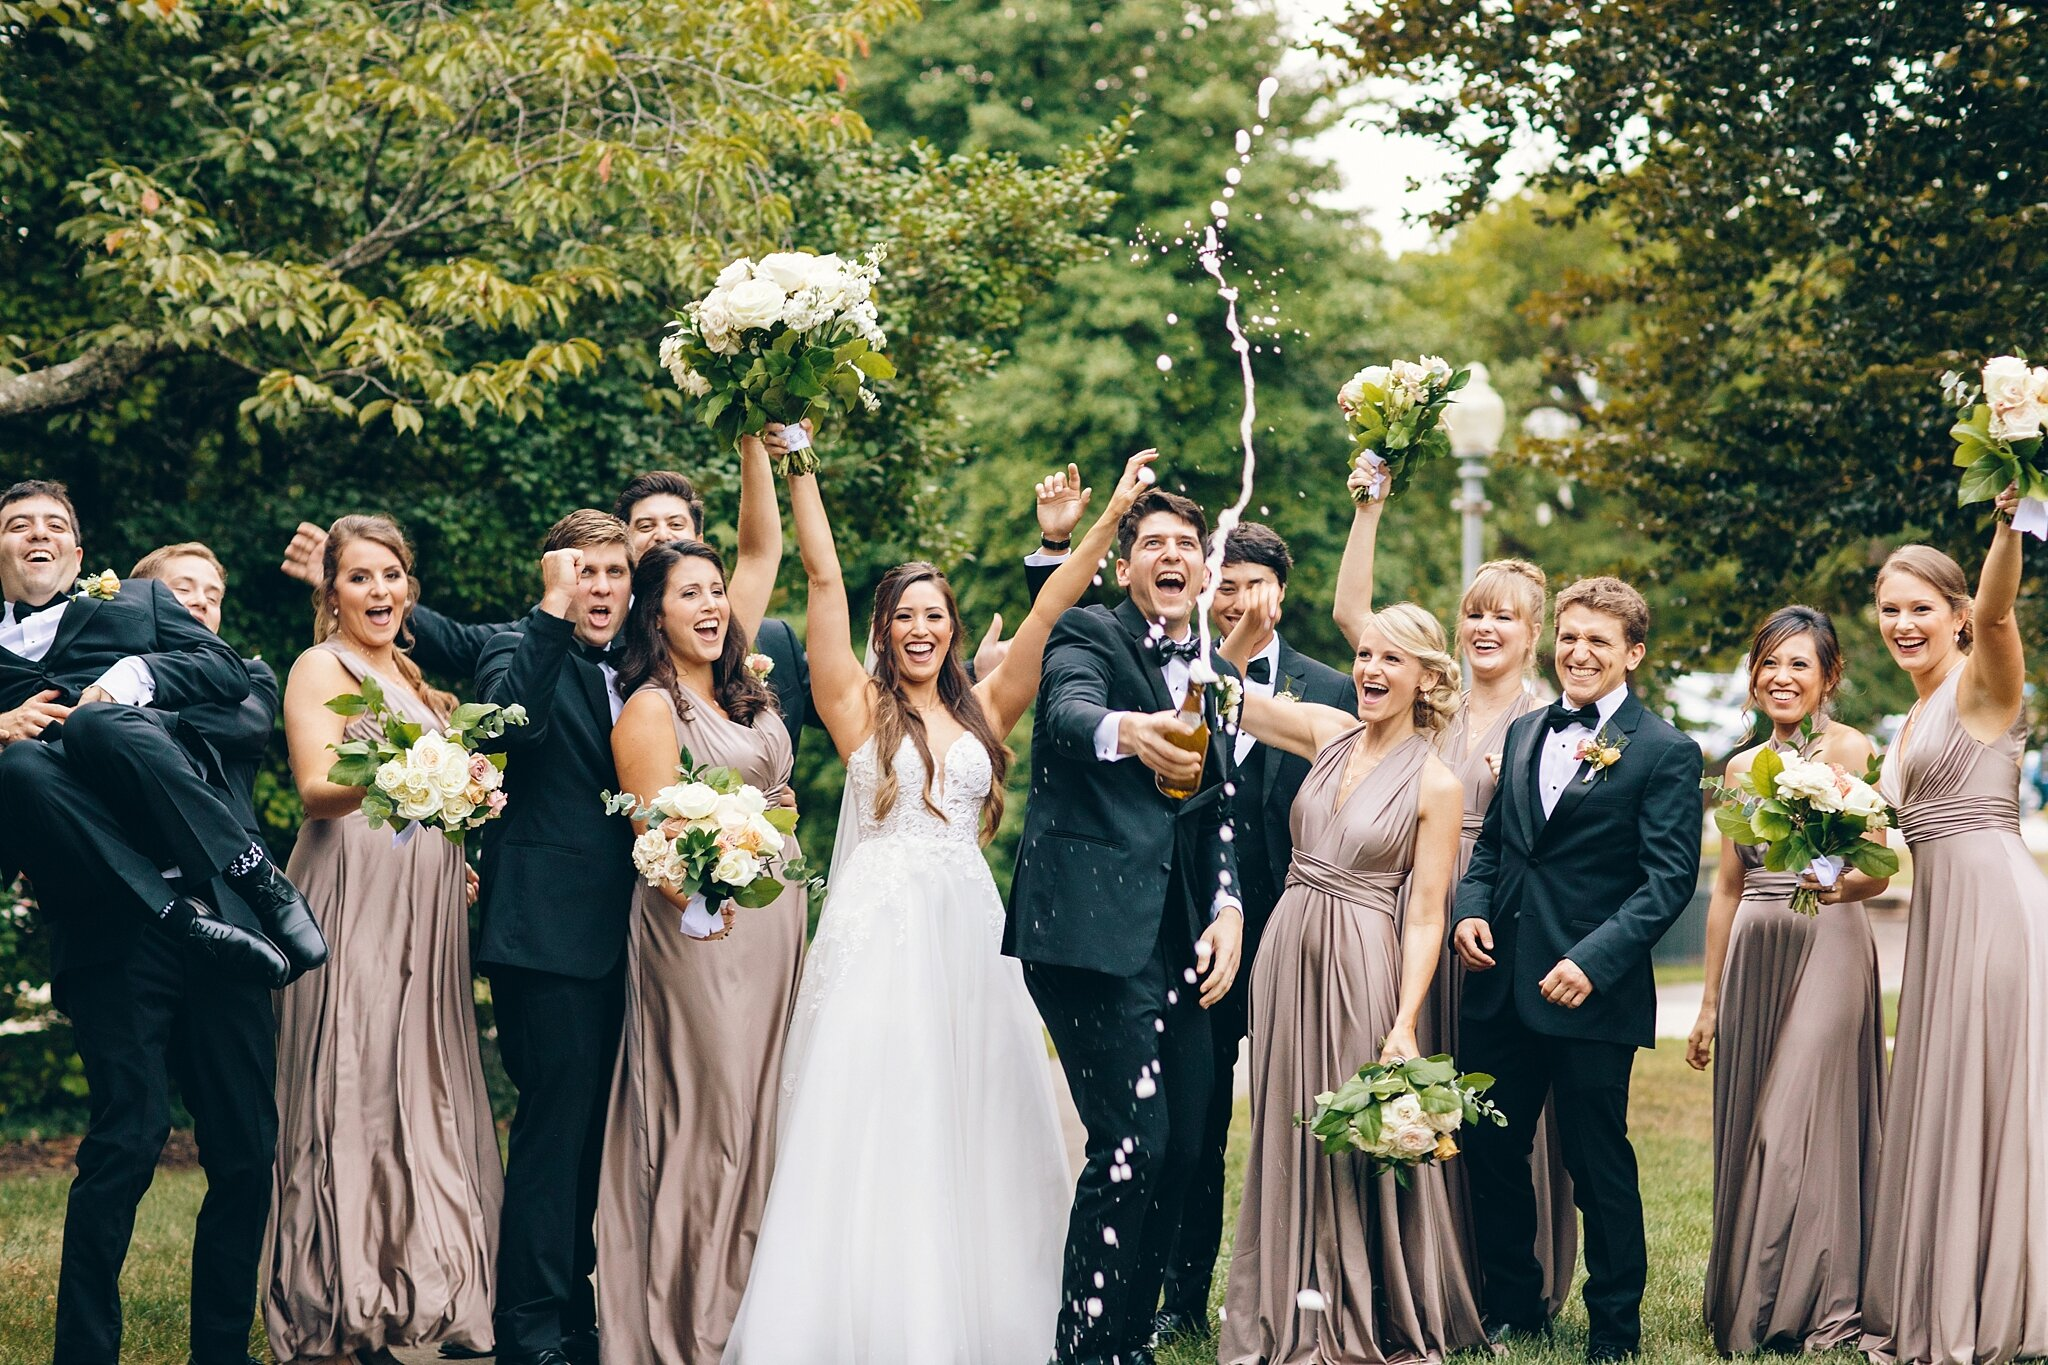 patrick-henry-ballroom-wedding-roanoke_0513.jpg